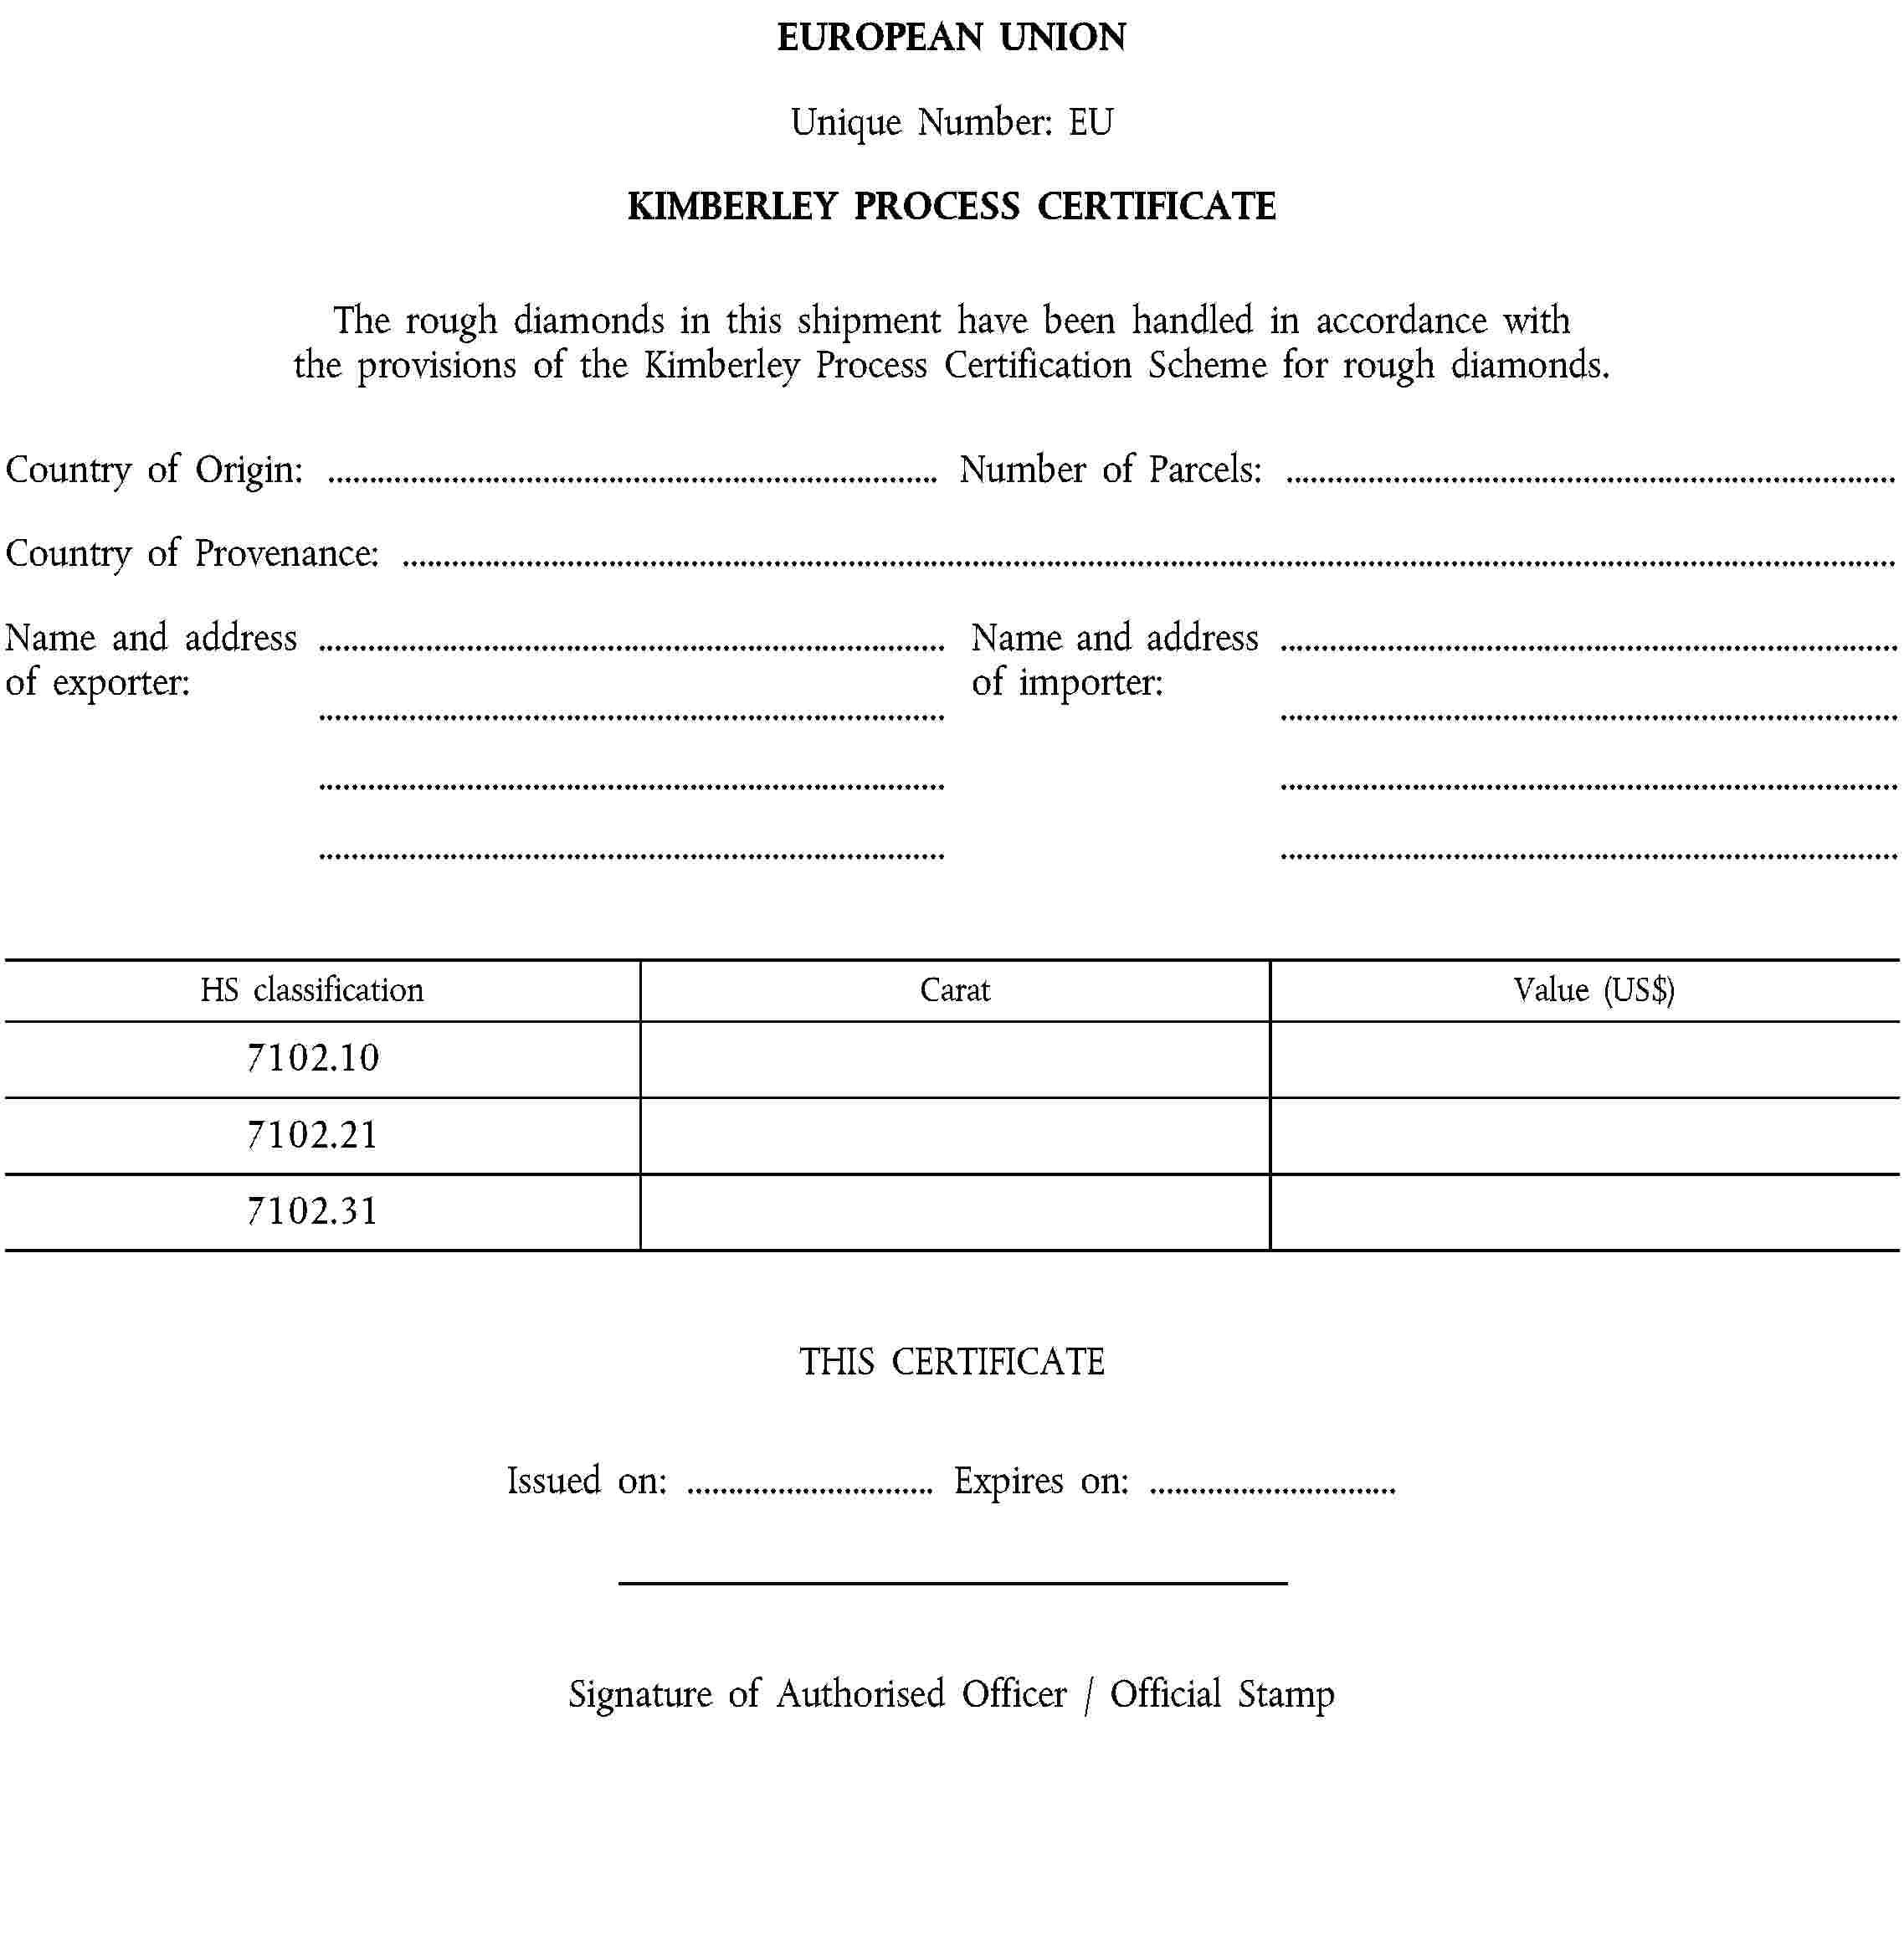 EUR-Lex - 02002R2368-20141029 - EN - EUR-Lex